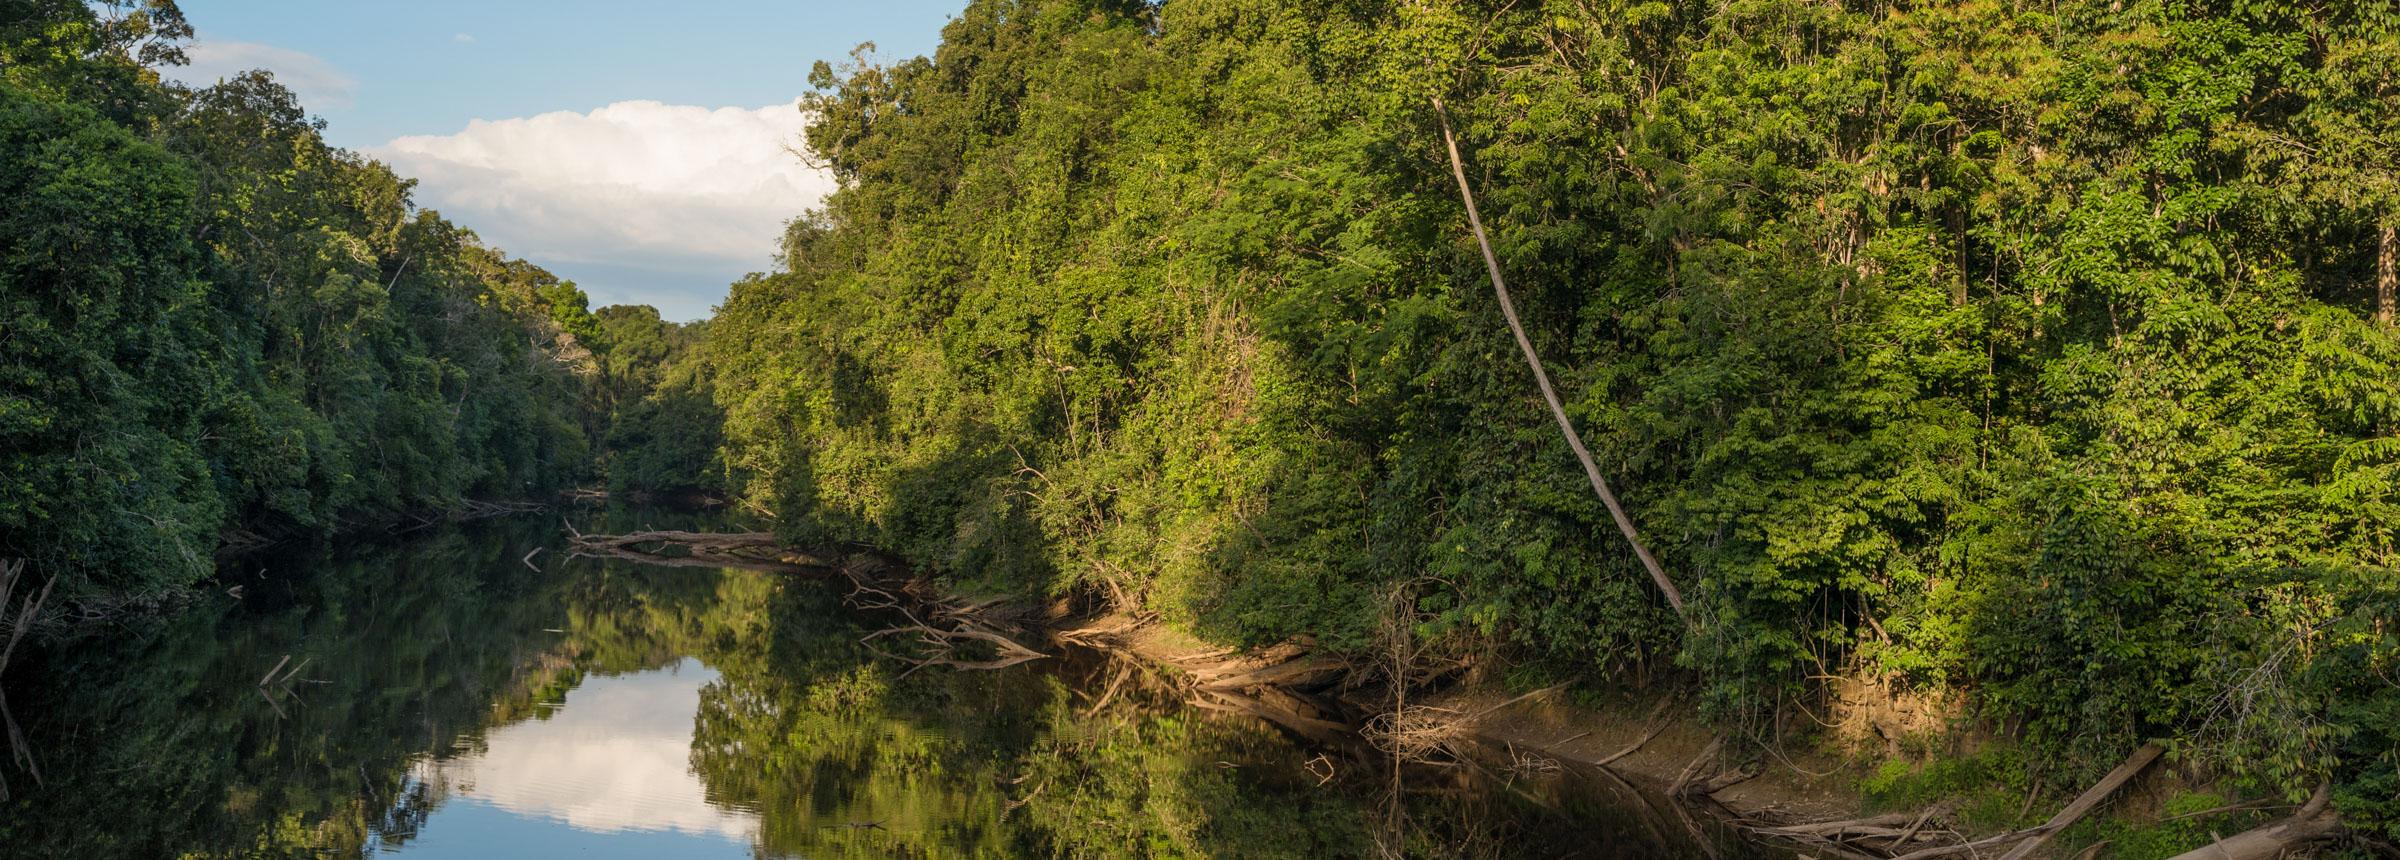 Guyana landscape